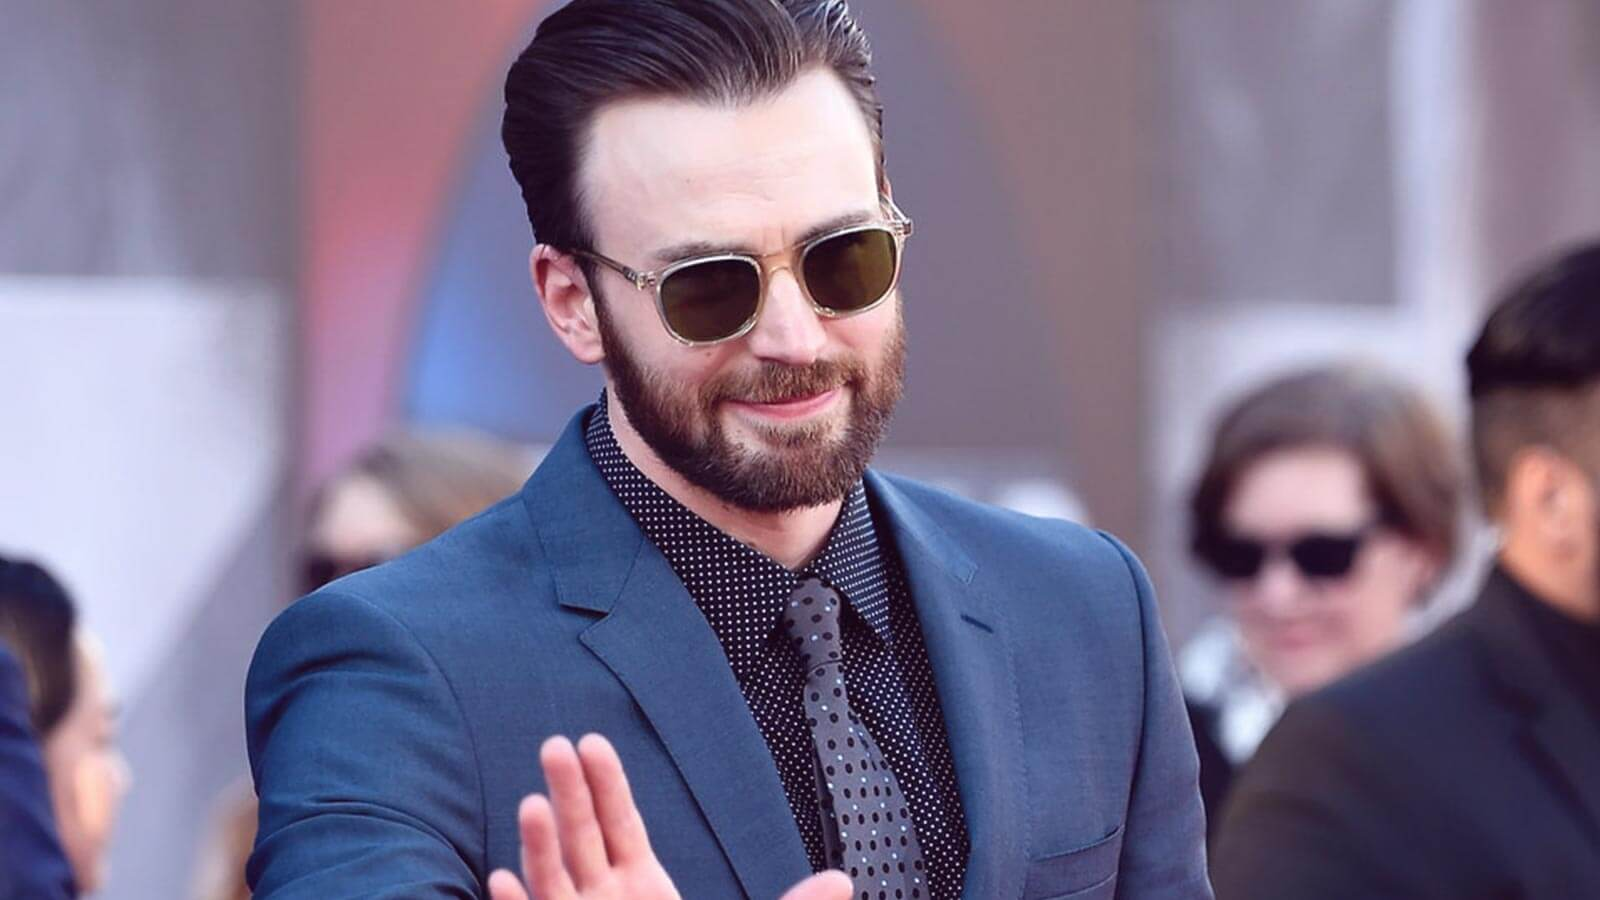 Perk up like Captain America with Chris Evans Glasses